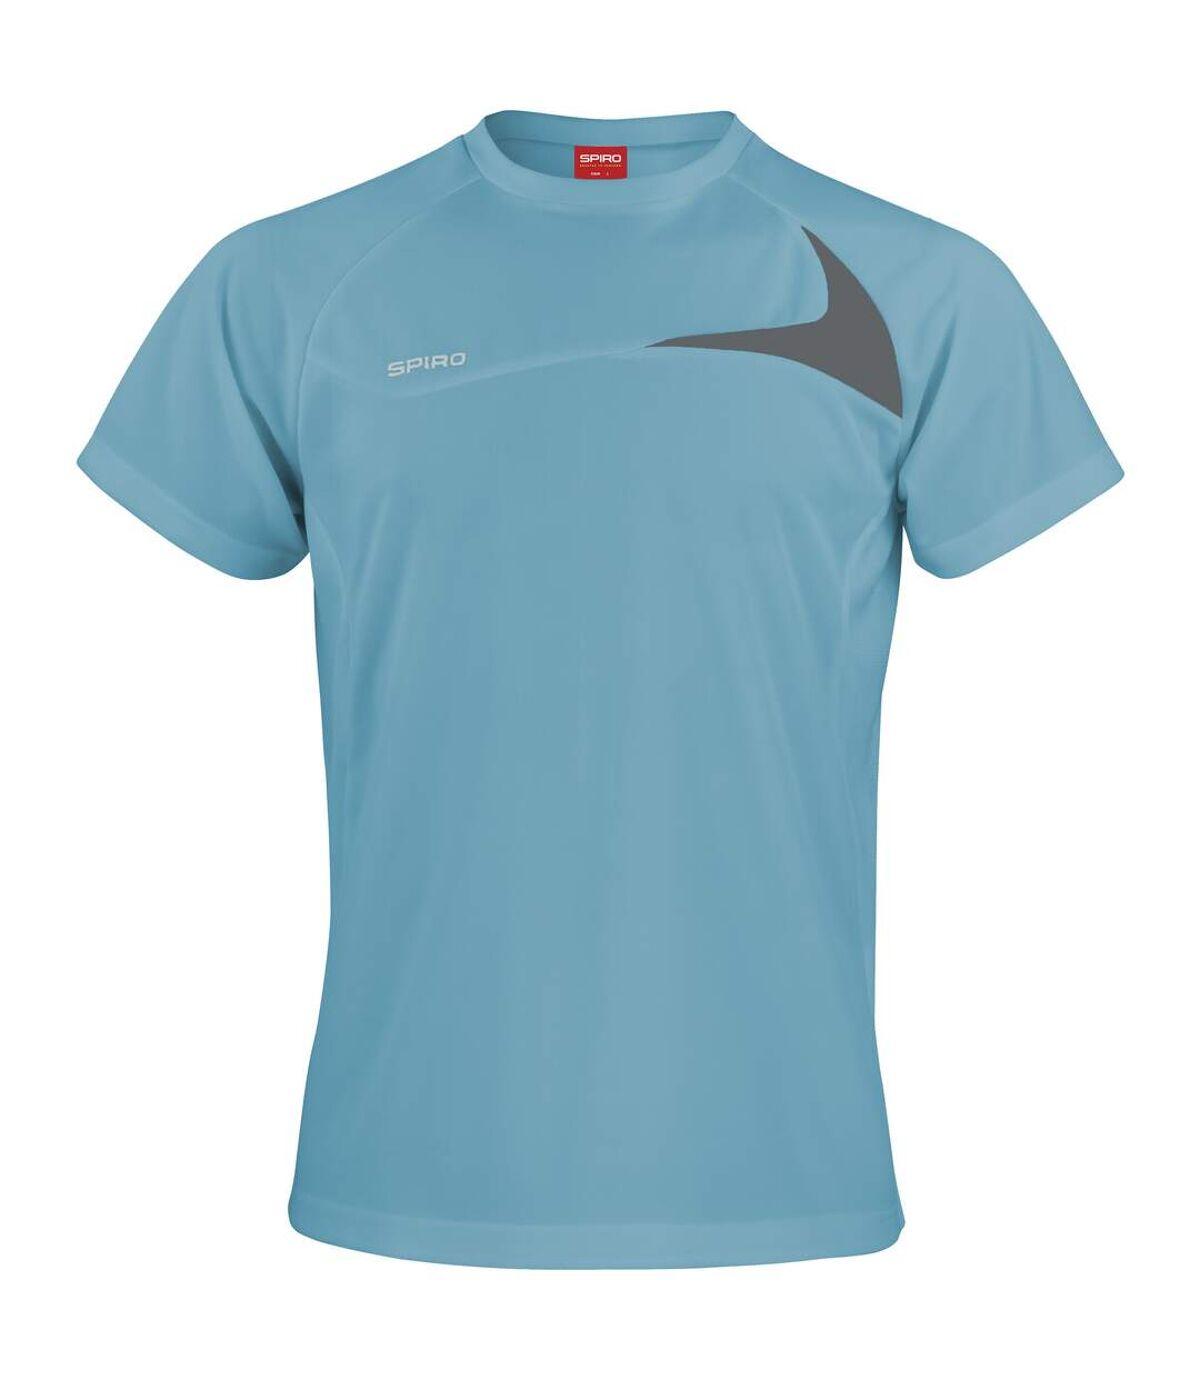 Spiro Mens Sports Dash Performance Training Shirt (Navy/White) - UTRW1476